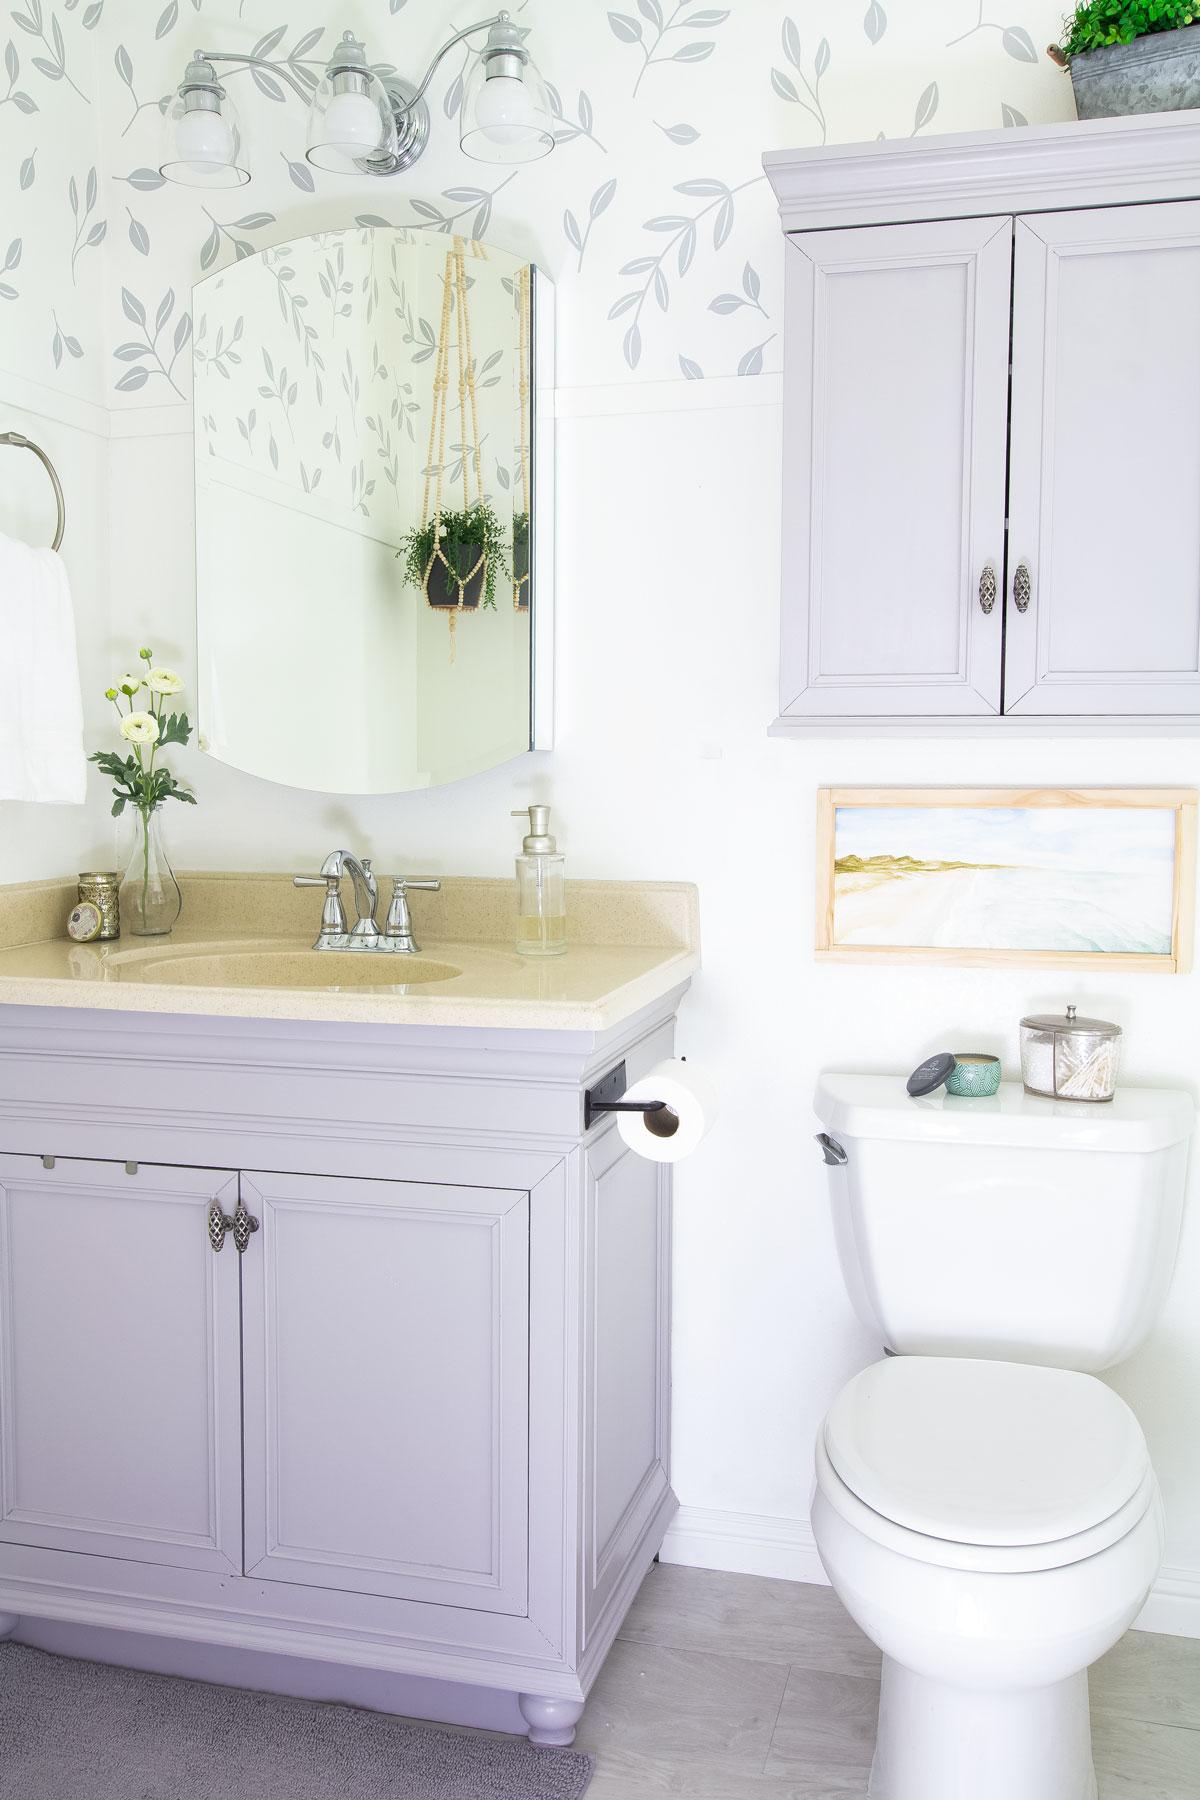 modern coastal bathroom makeover reveal bathroom gray vanity with leaf wallpaper and modern coastal elements